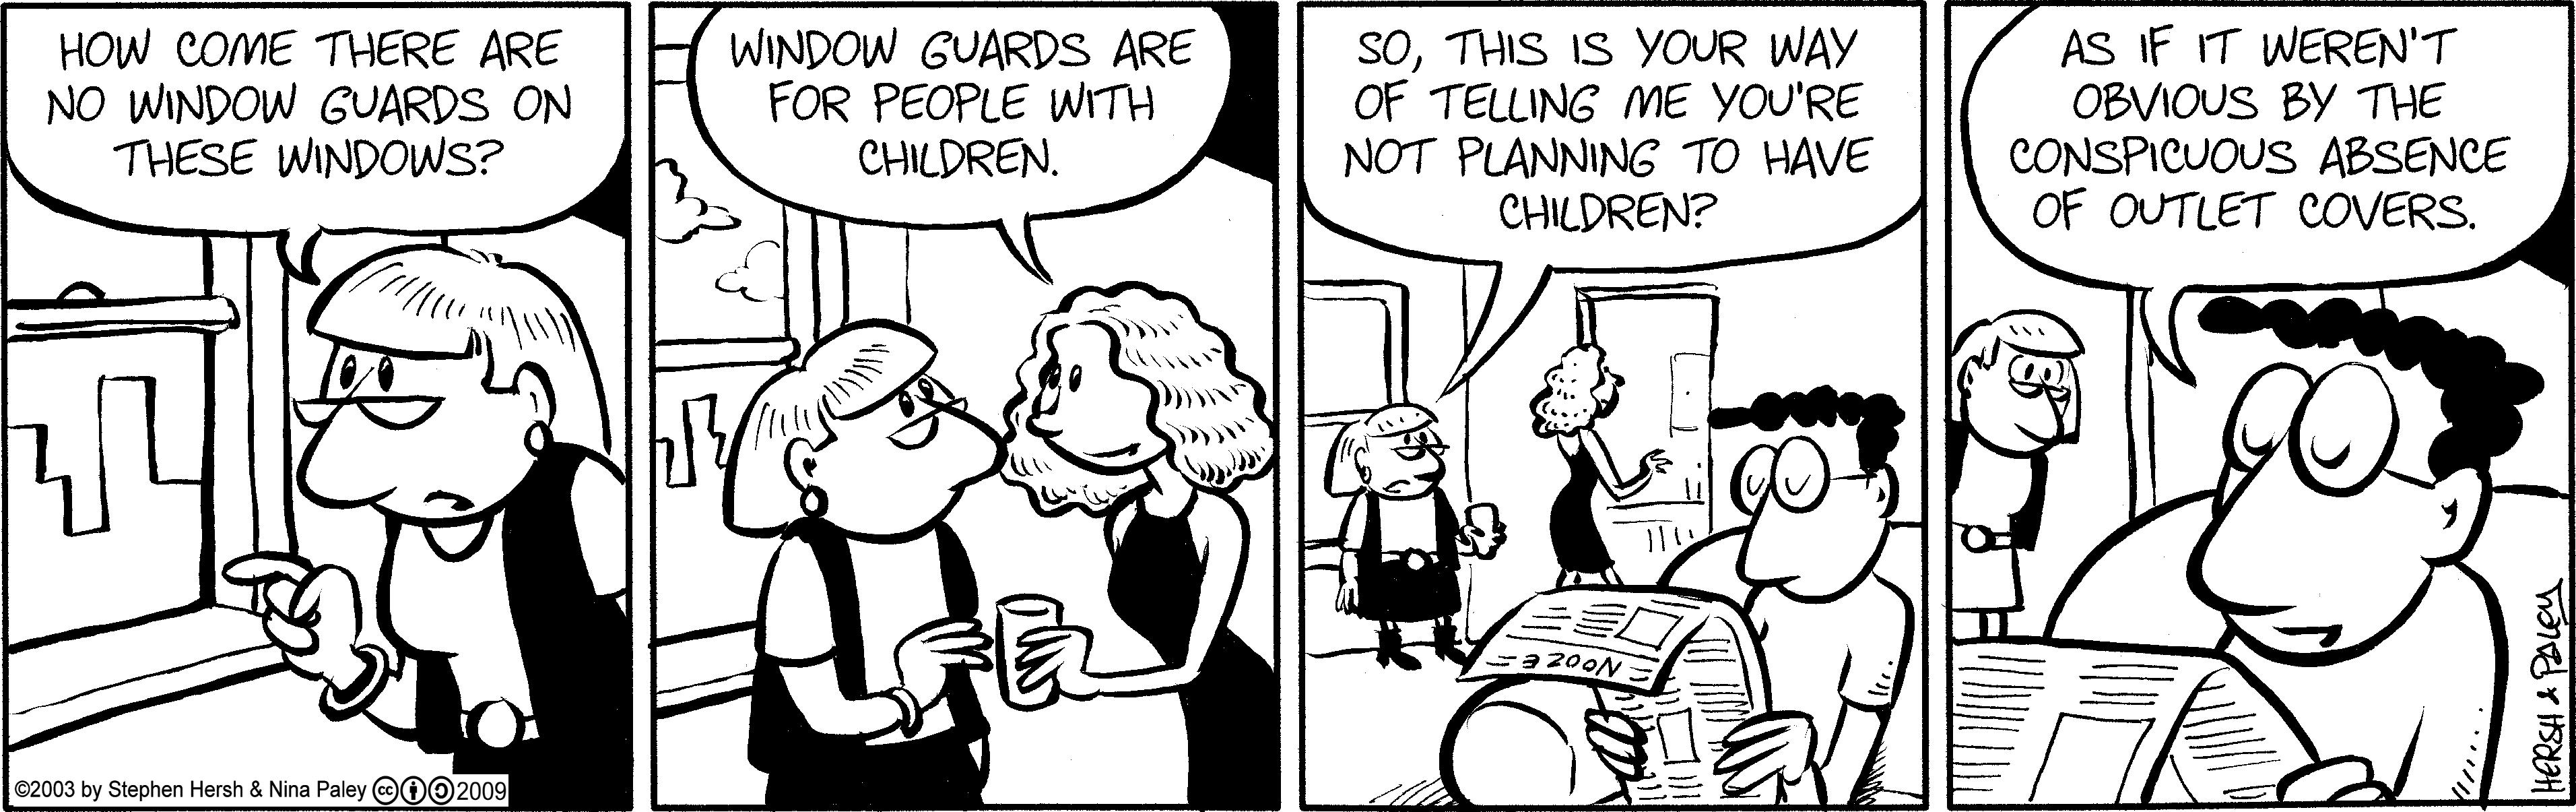 06/12/2003